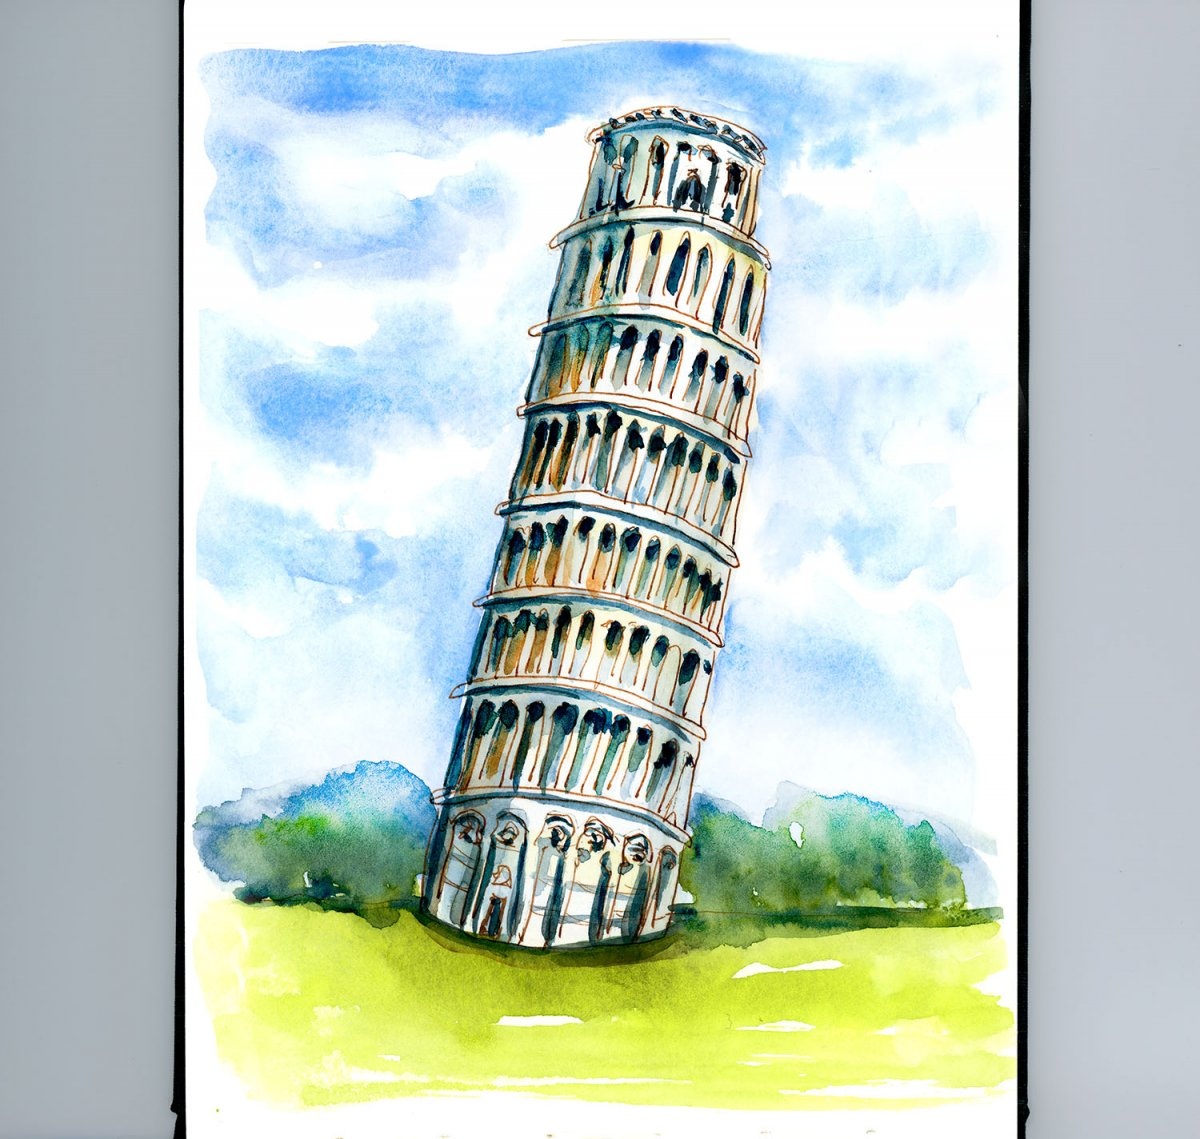 Day 15 - Leaning Tower Of Pisa Watercolor - Doodlewash